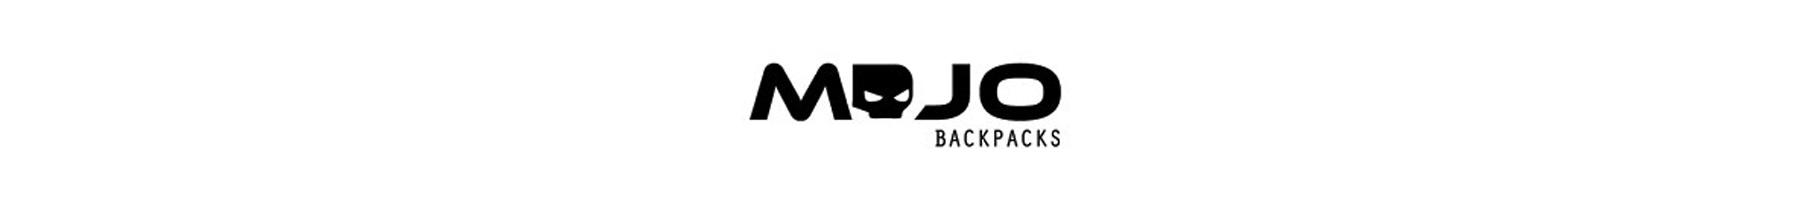 DrJays.com - Mojo